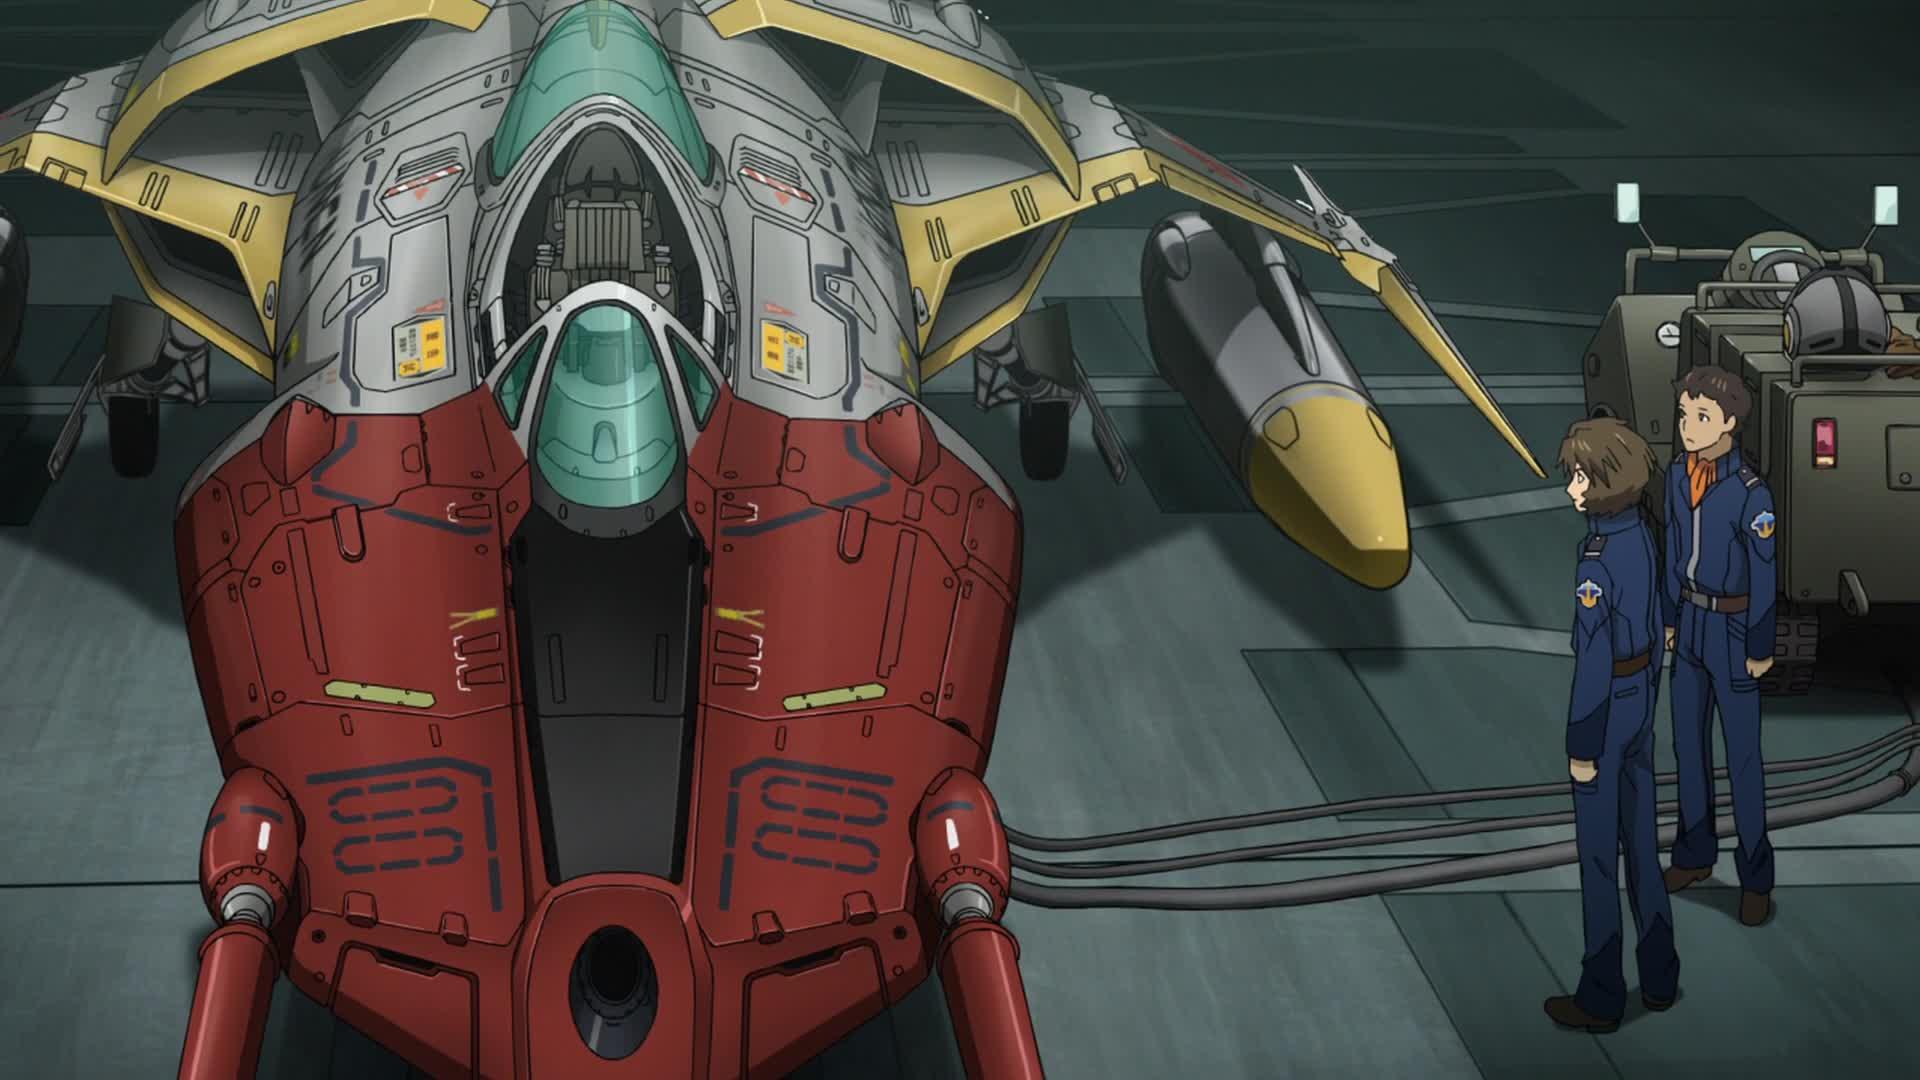 Anime Nyc On Twitter Every Frame Of Space Battleship Yamato 2199